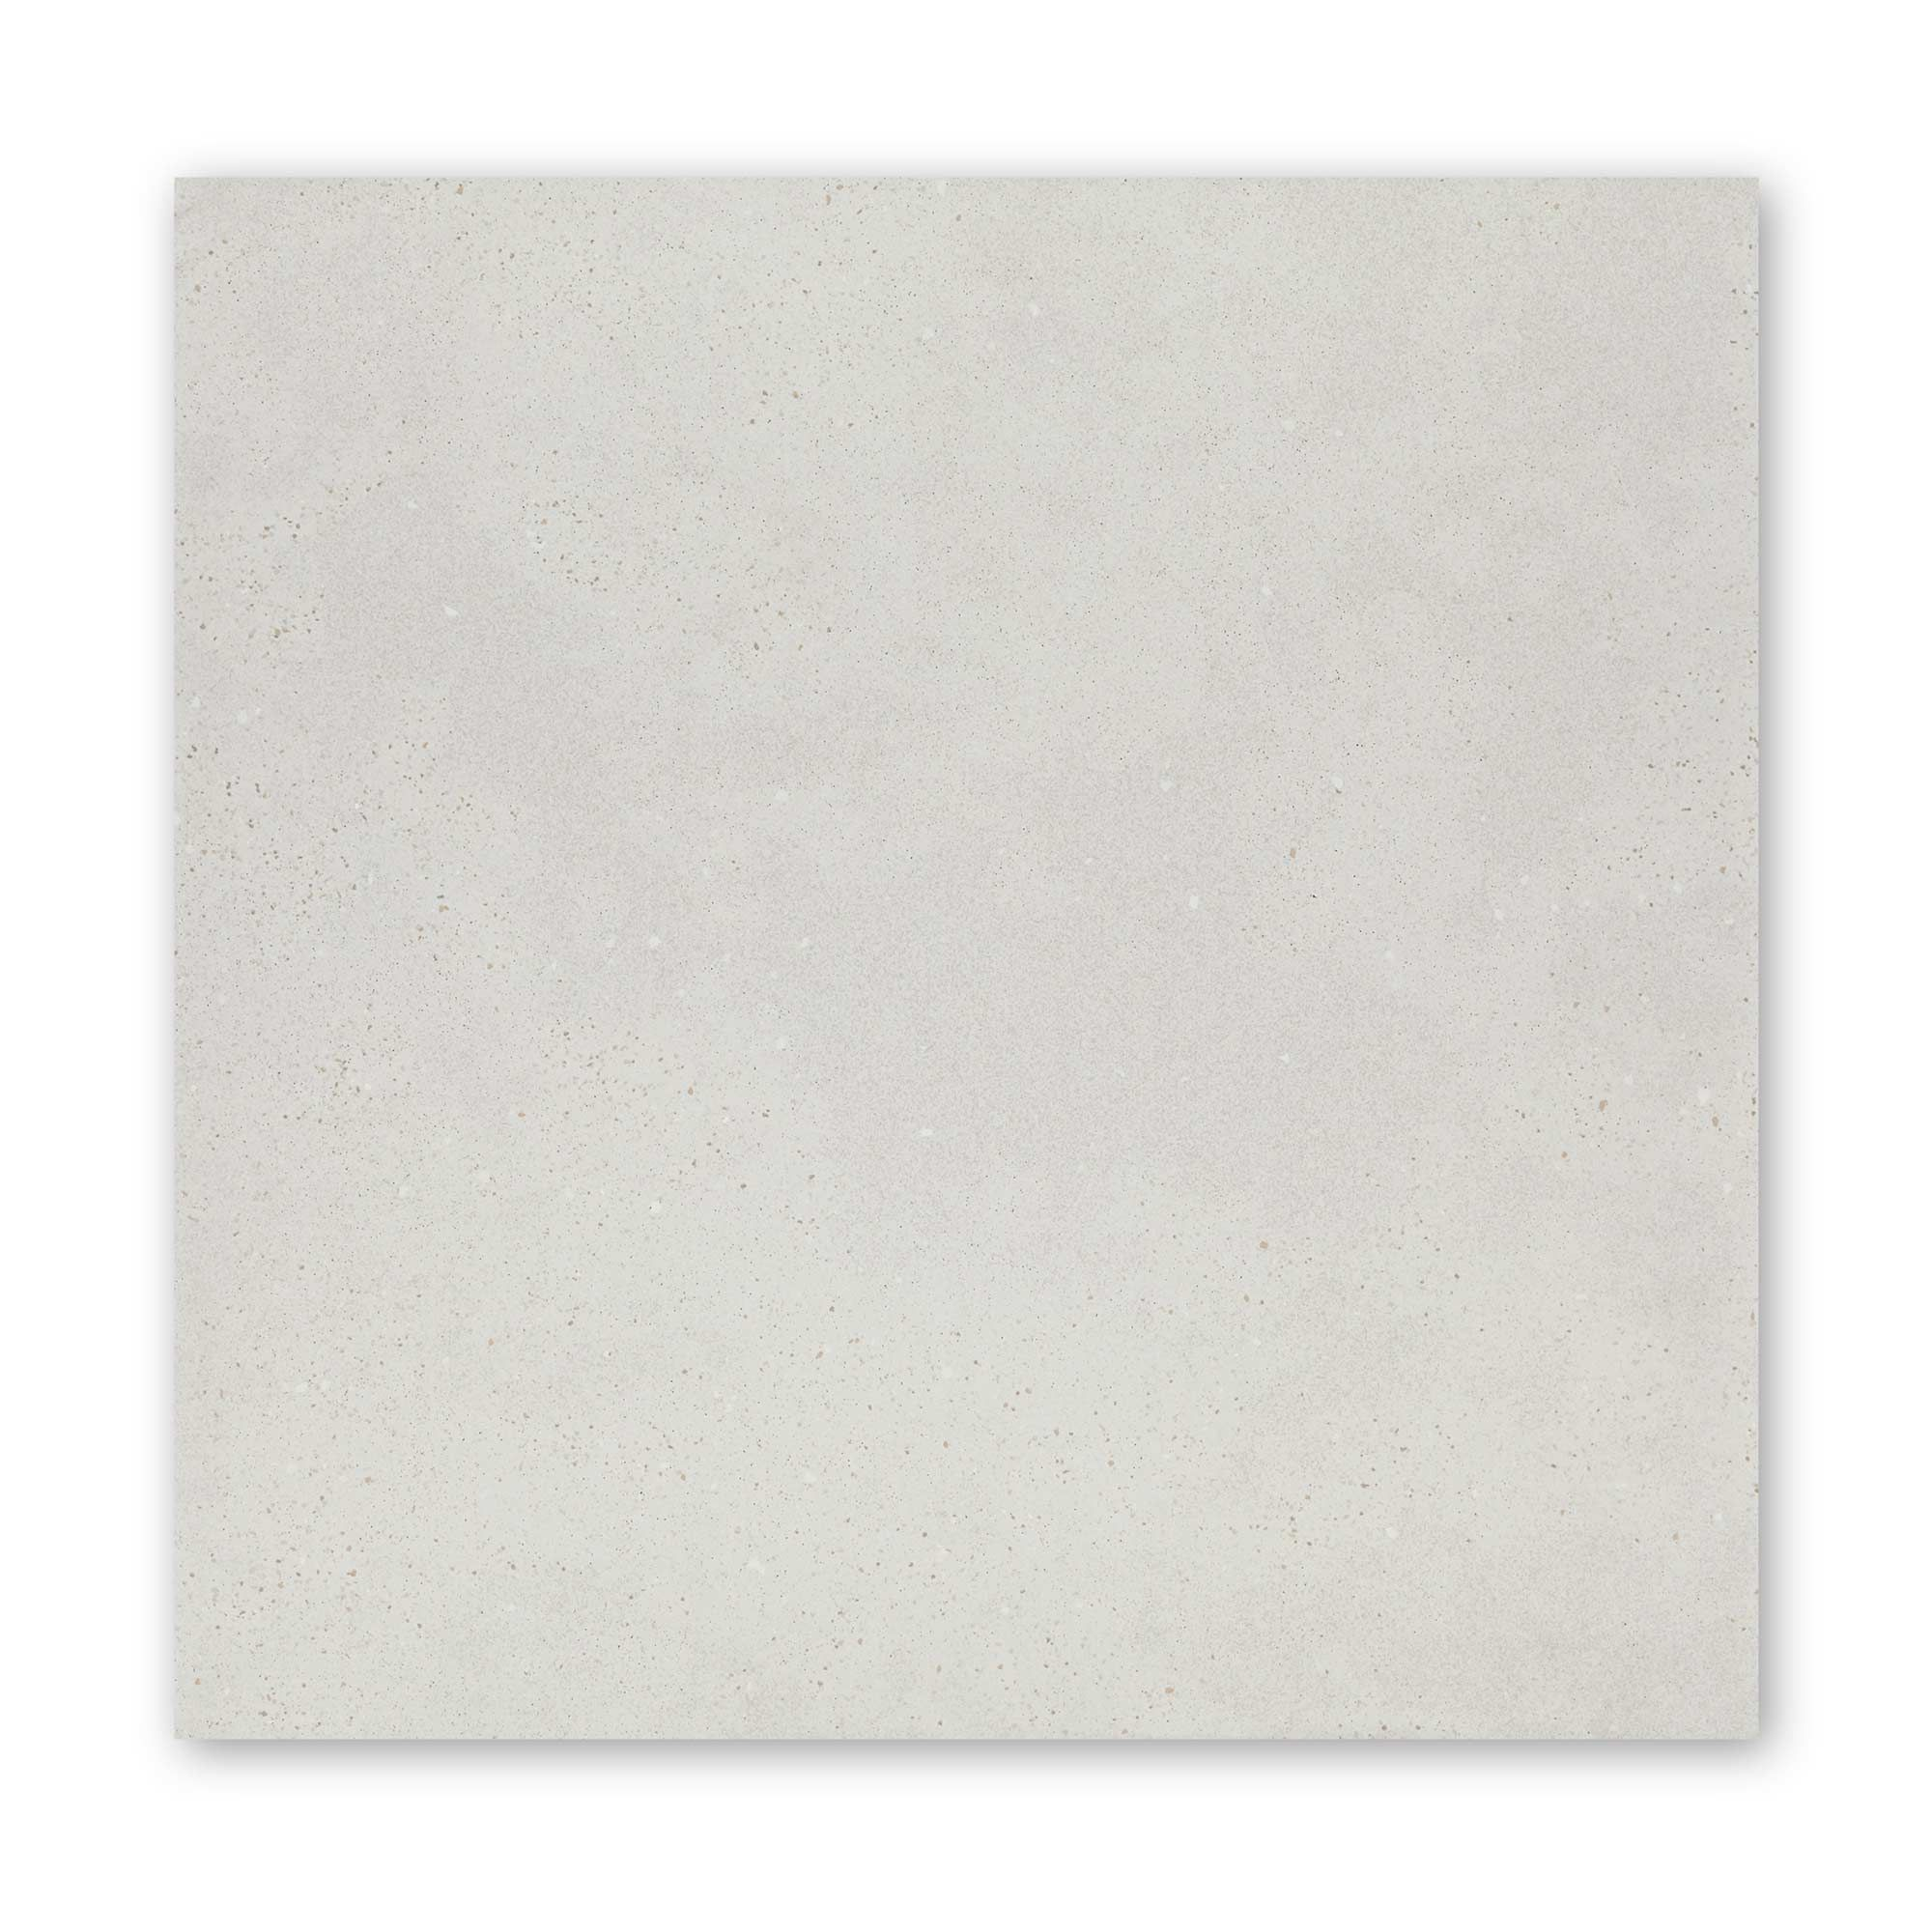 Umbrian White 60x60